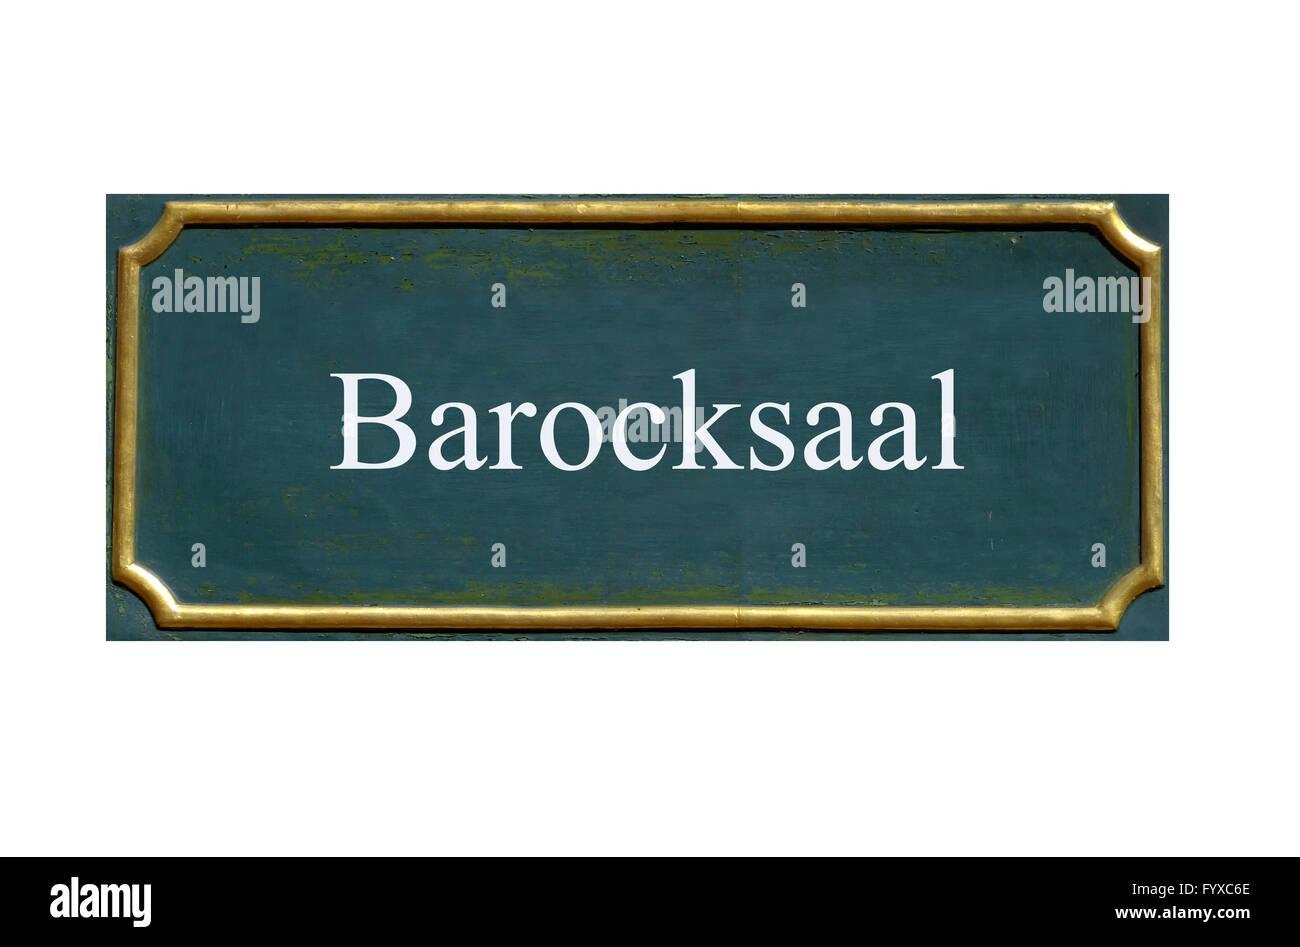 shield barock saloon Stock Photo